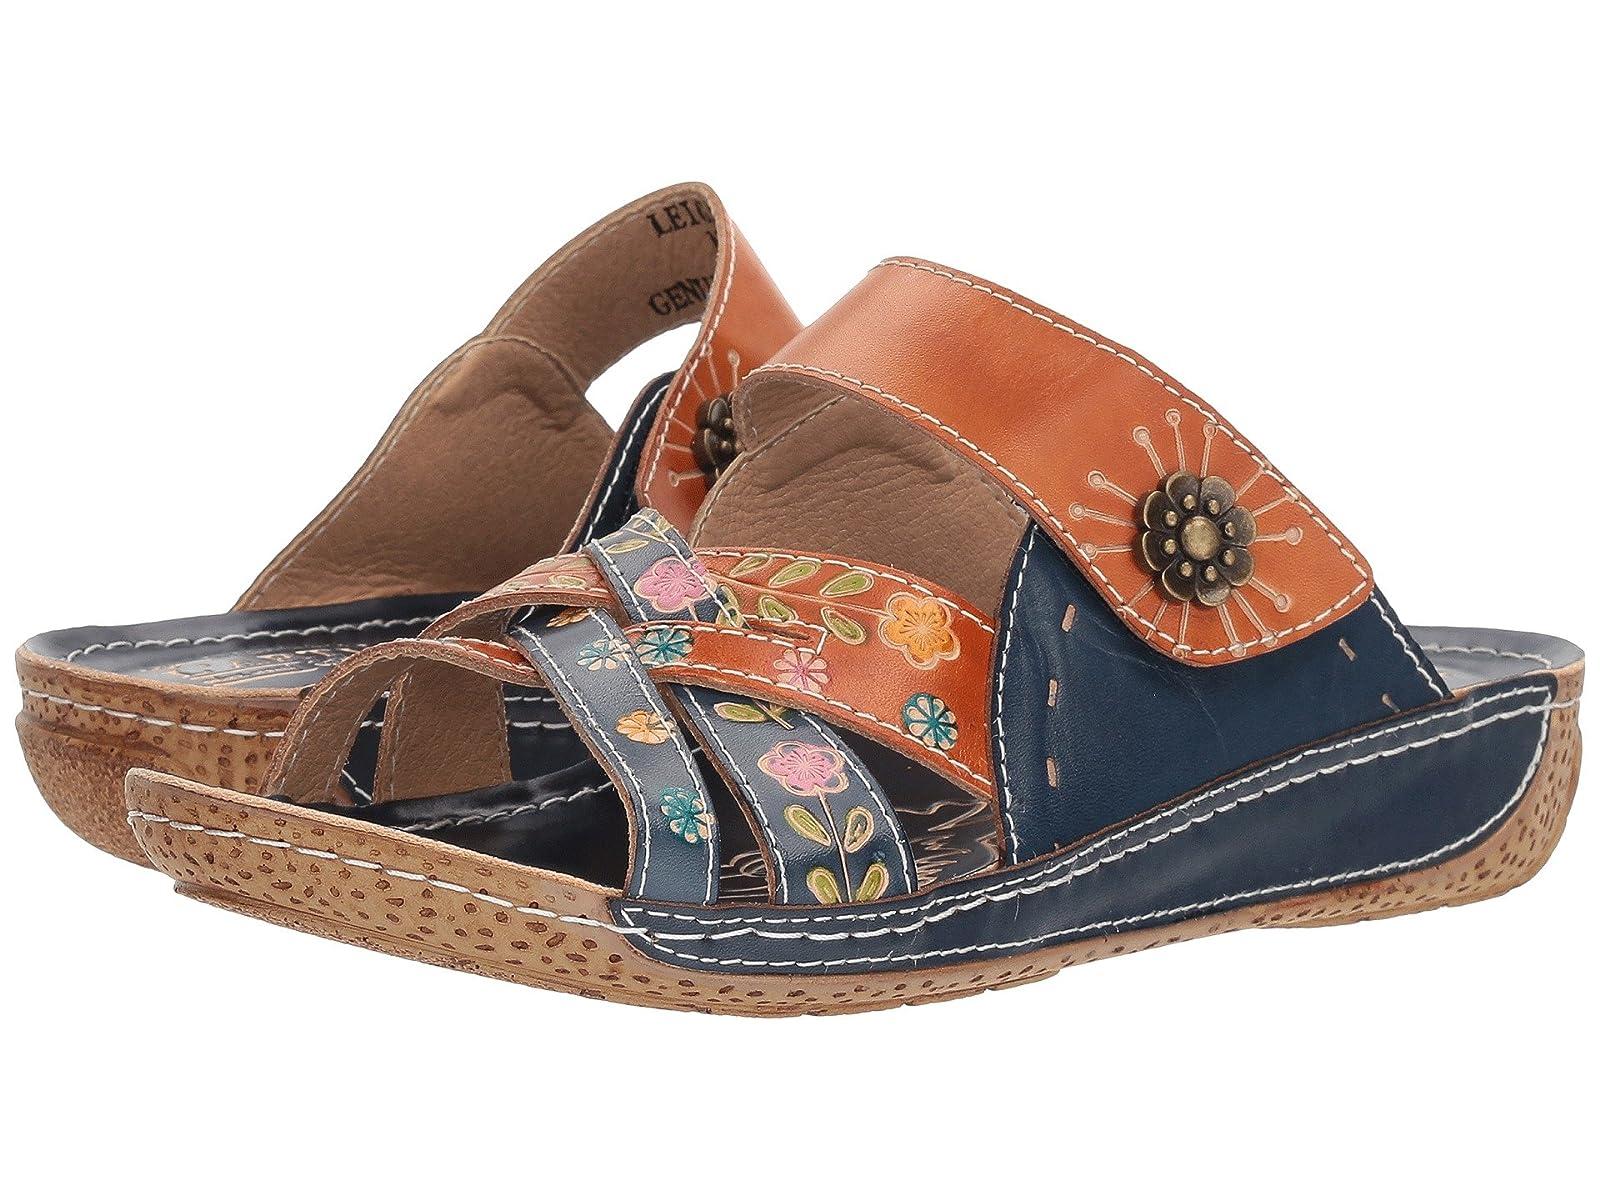 L'Artiste by Spring Step LeighAtmospheric grades have affordable shoes